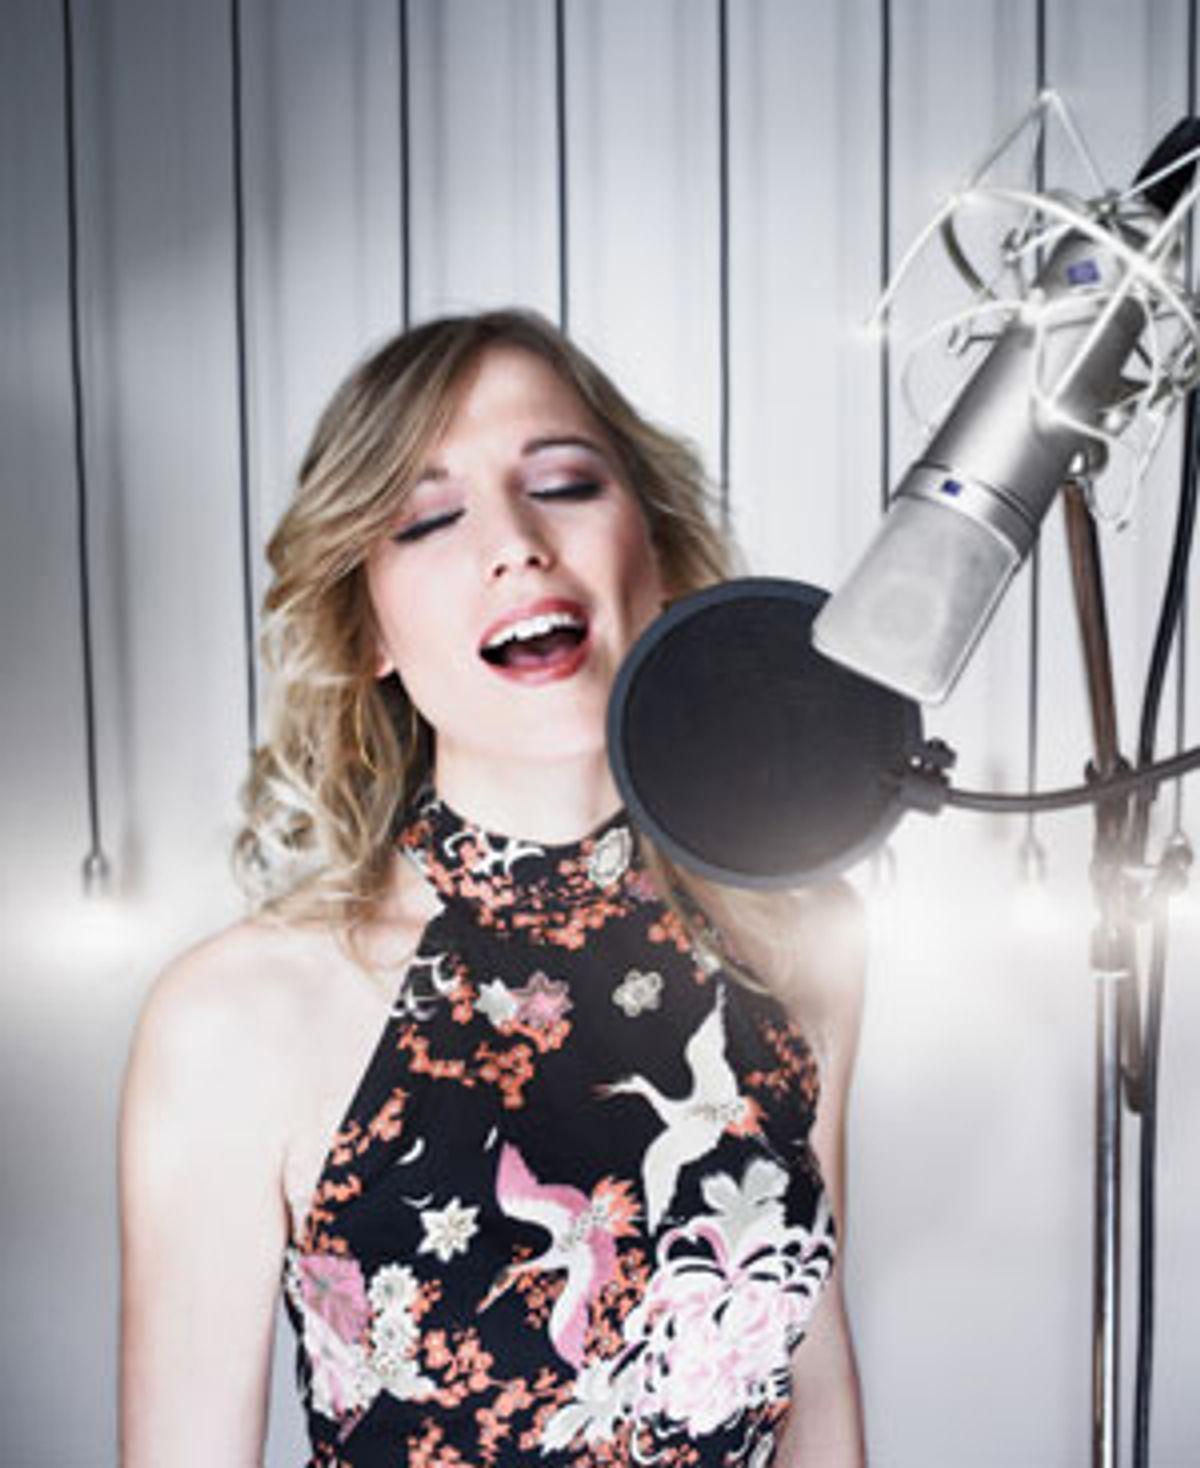 Photo of woman singing.